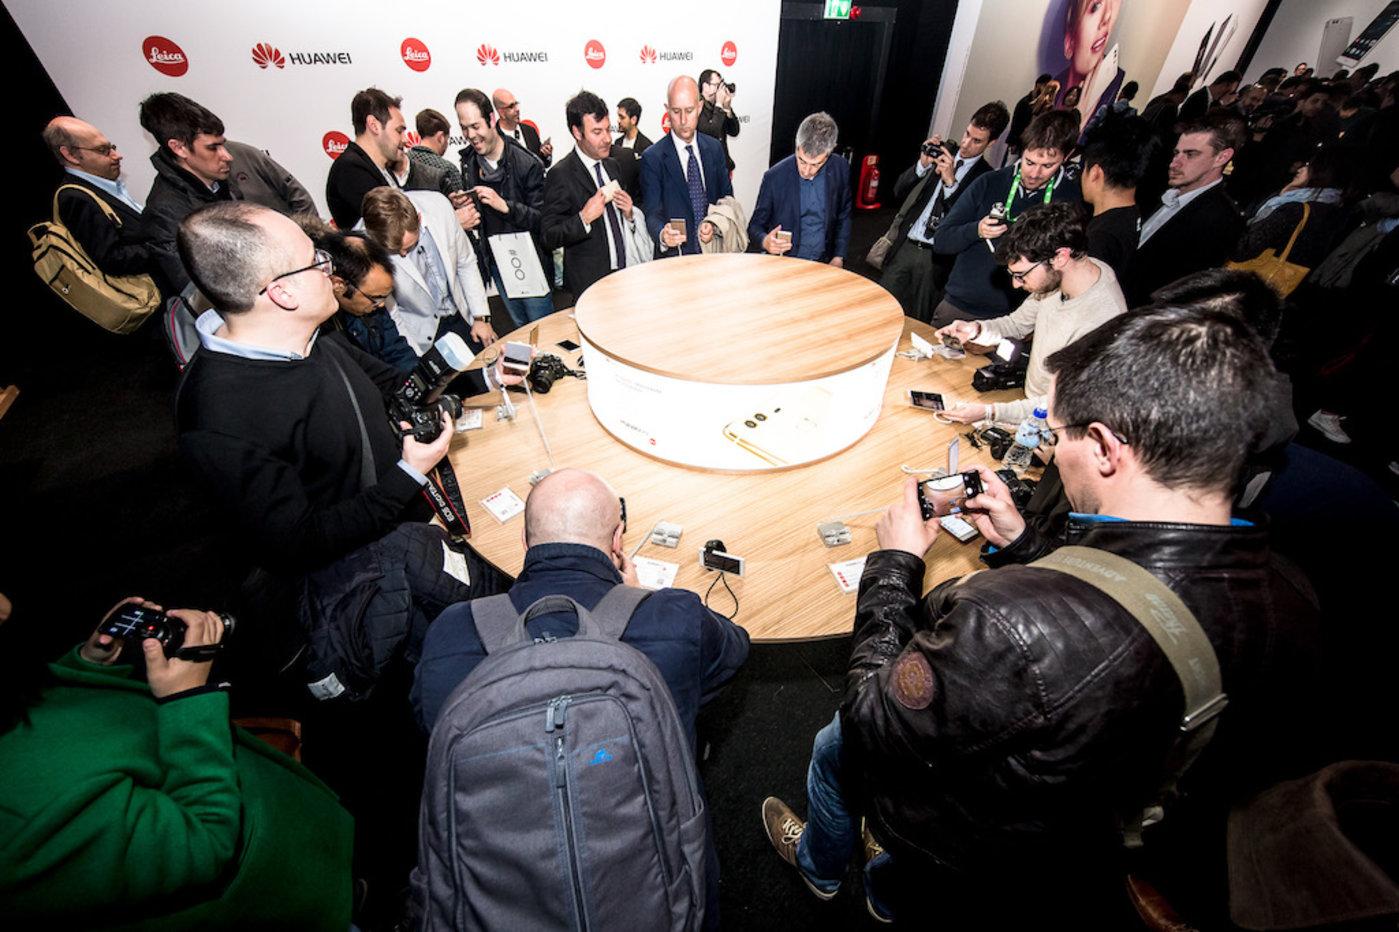 P9在伦敦发布就引发了国际媒体的关注